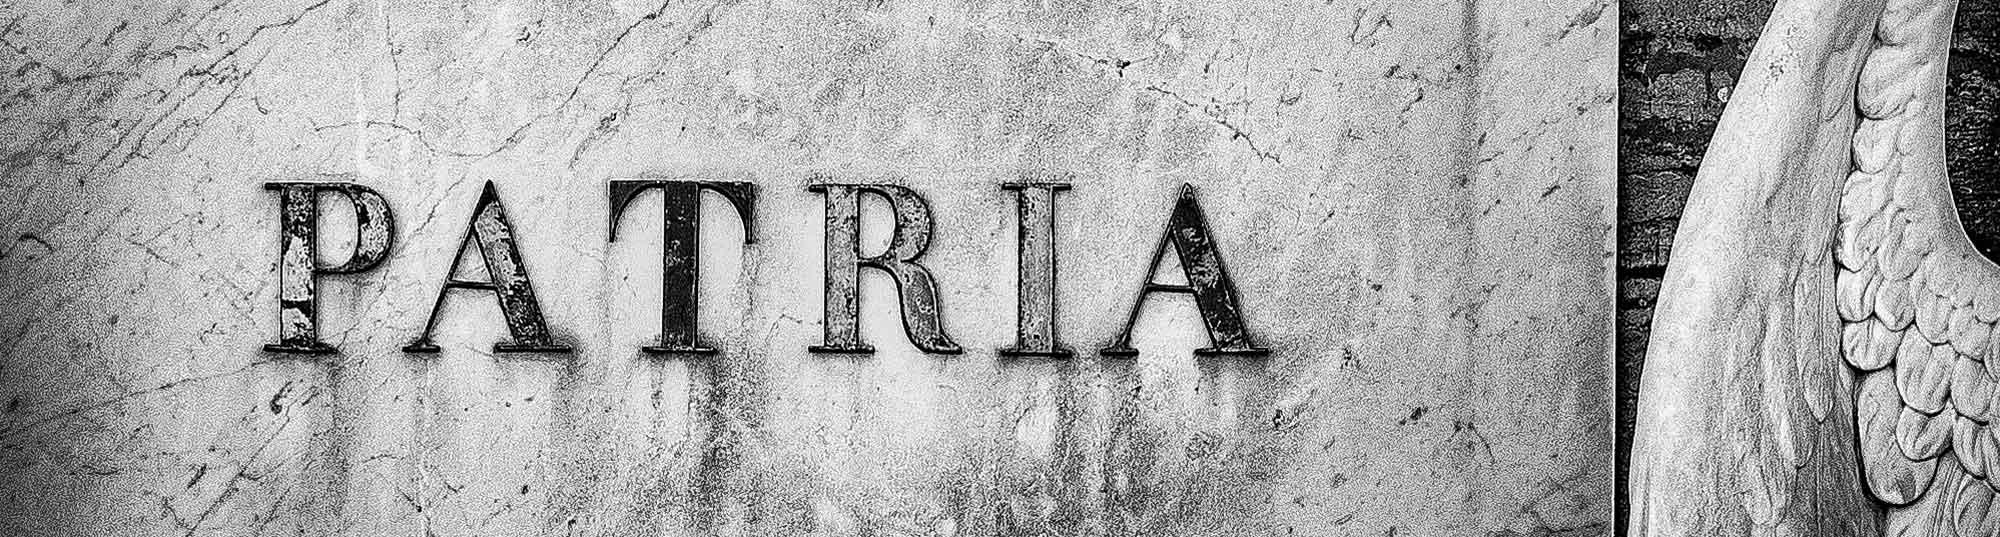 Patria typographie